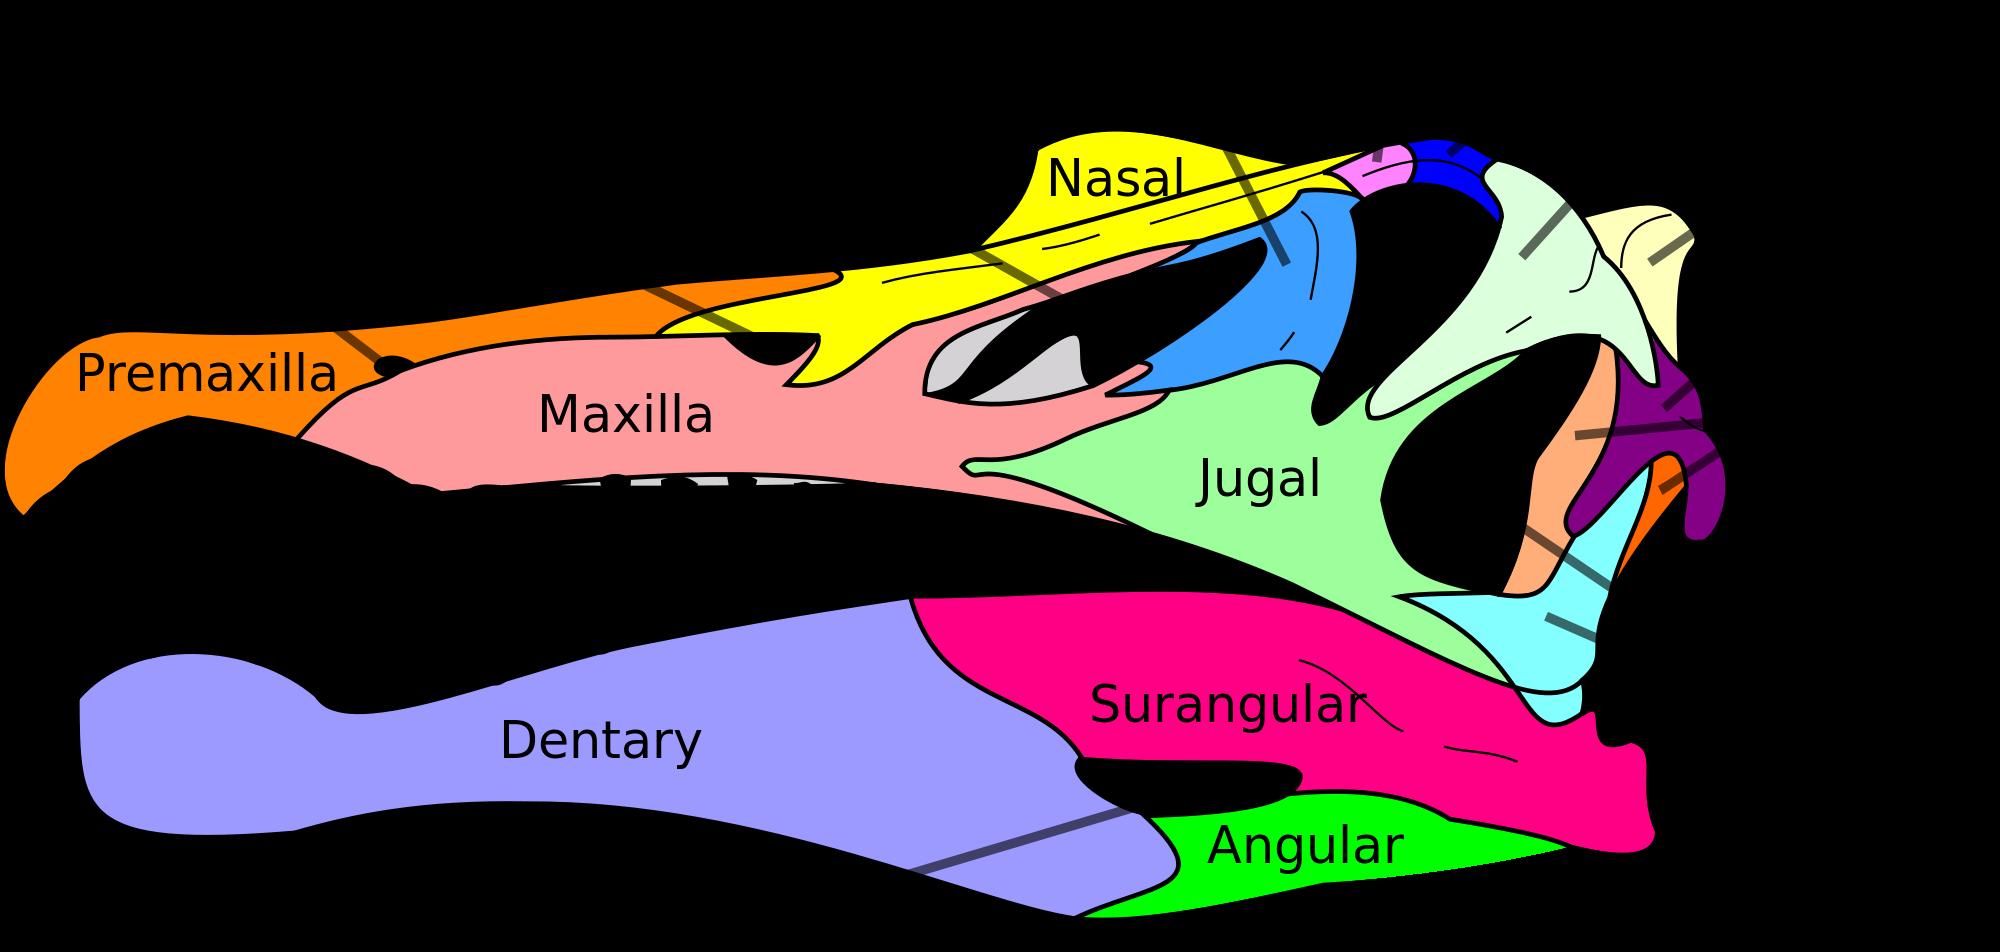 px spinosaurus skull. Geology clipart paleontologist tool